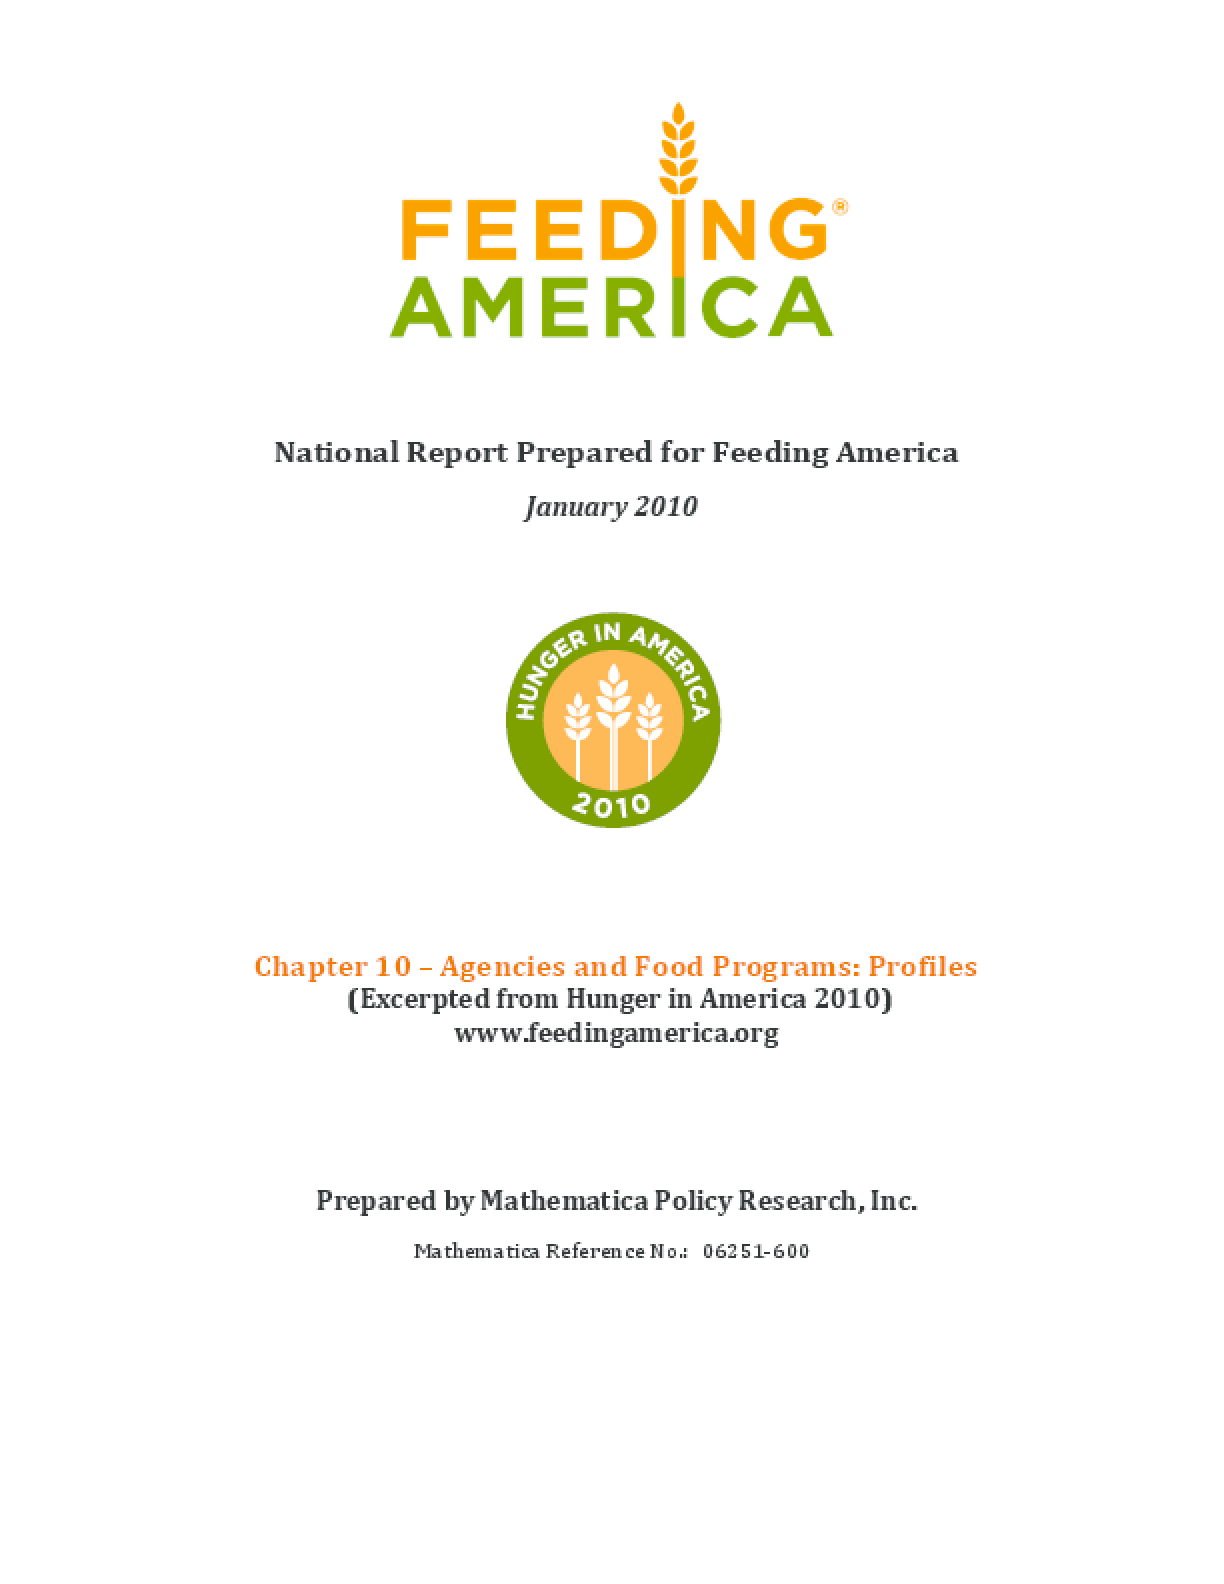 Feeding America Agencies and Food Programs: Profiles